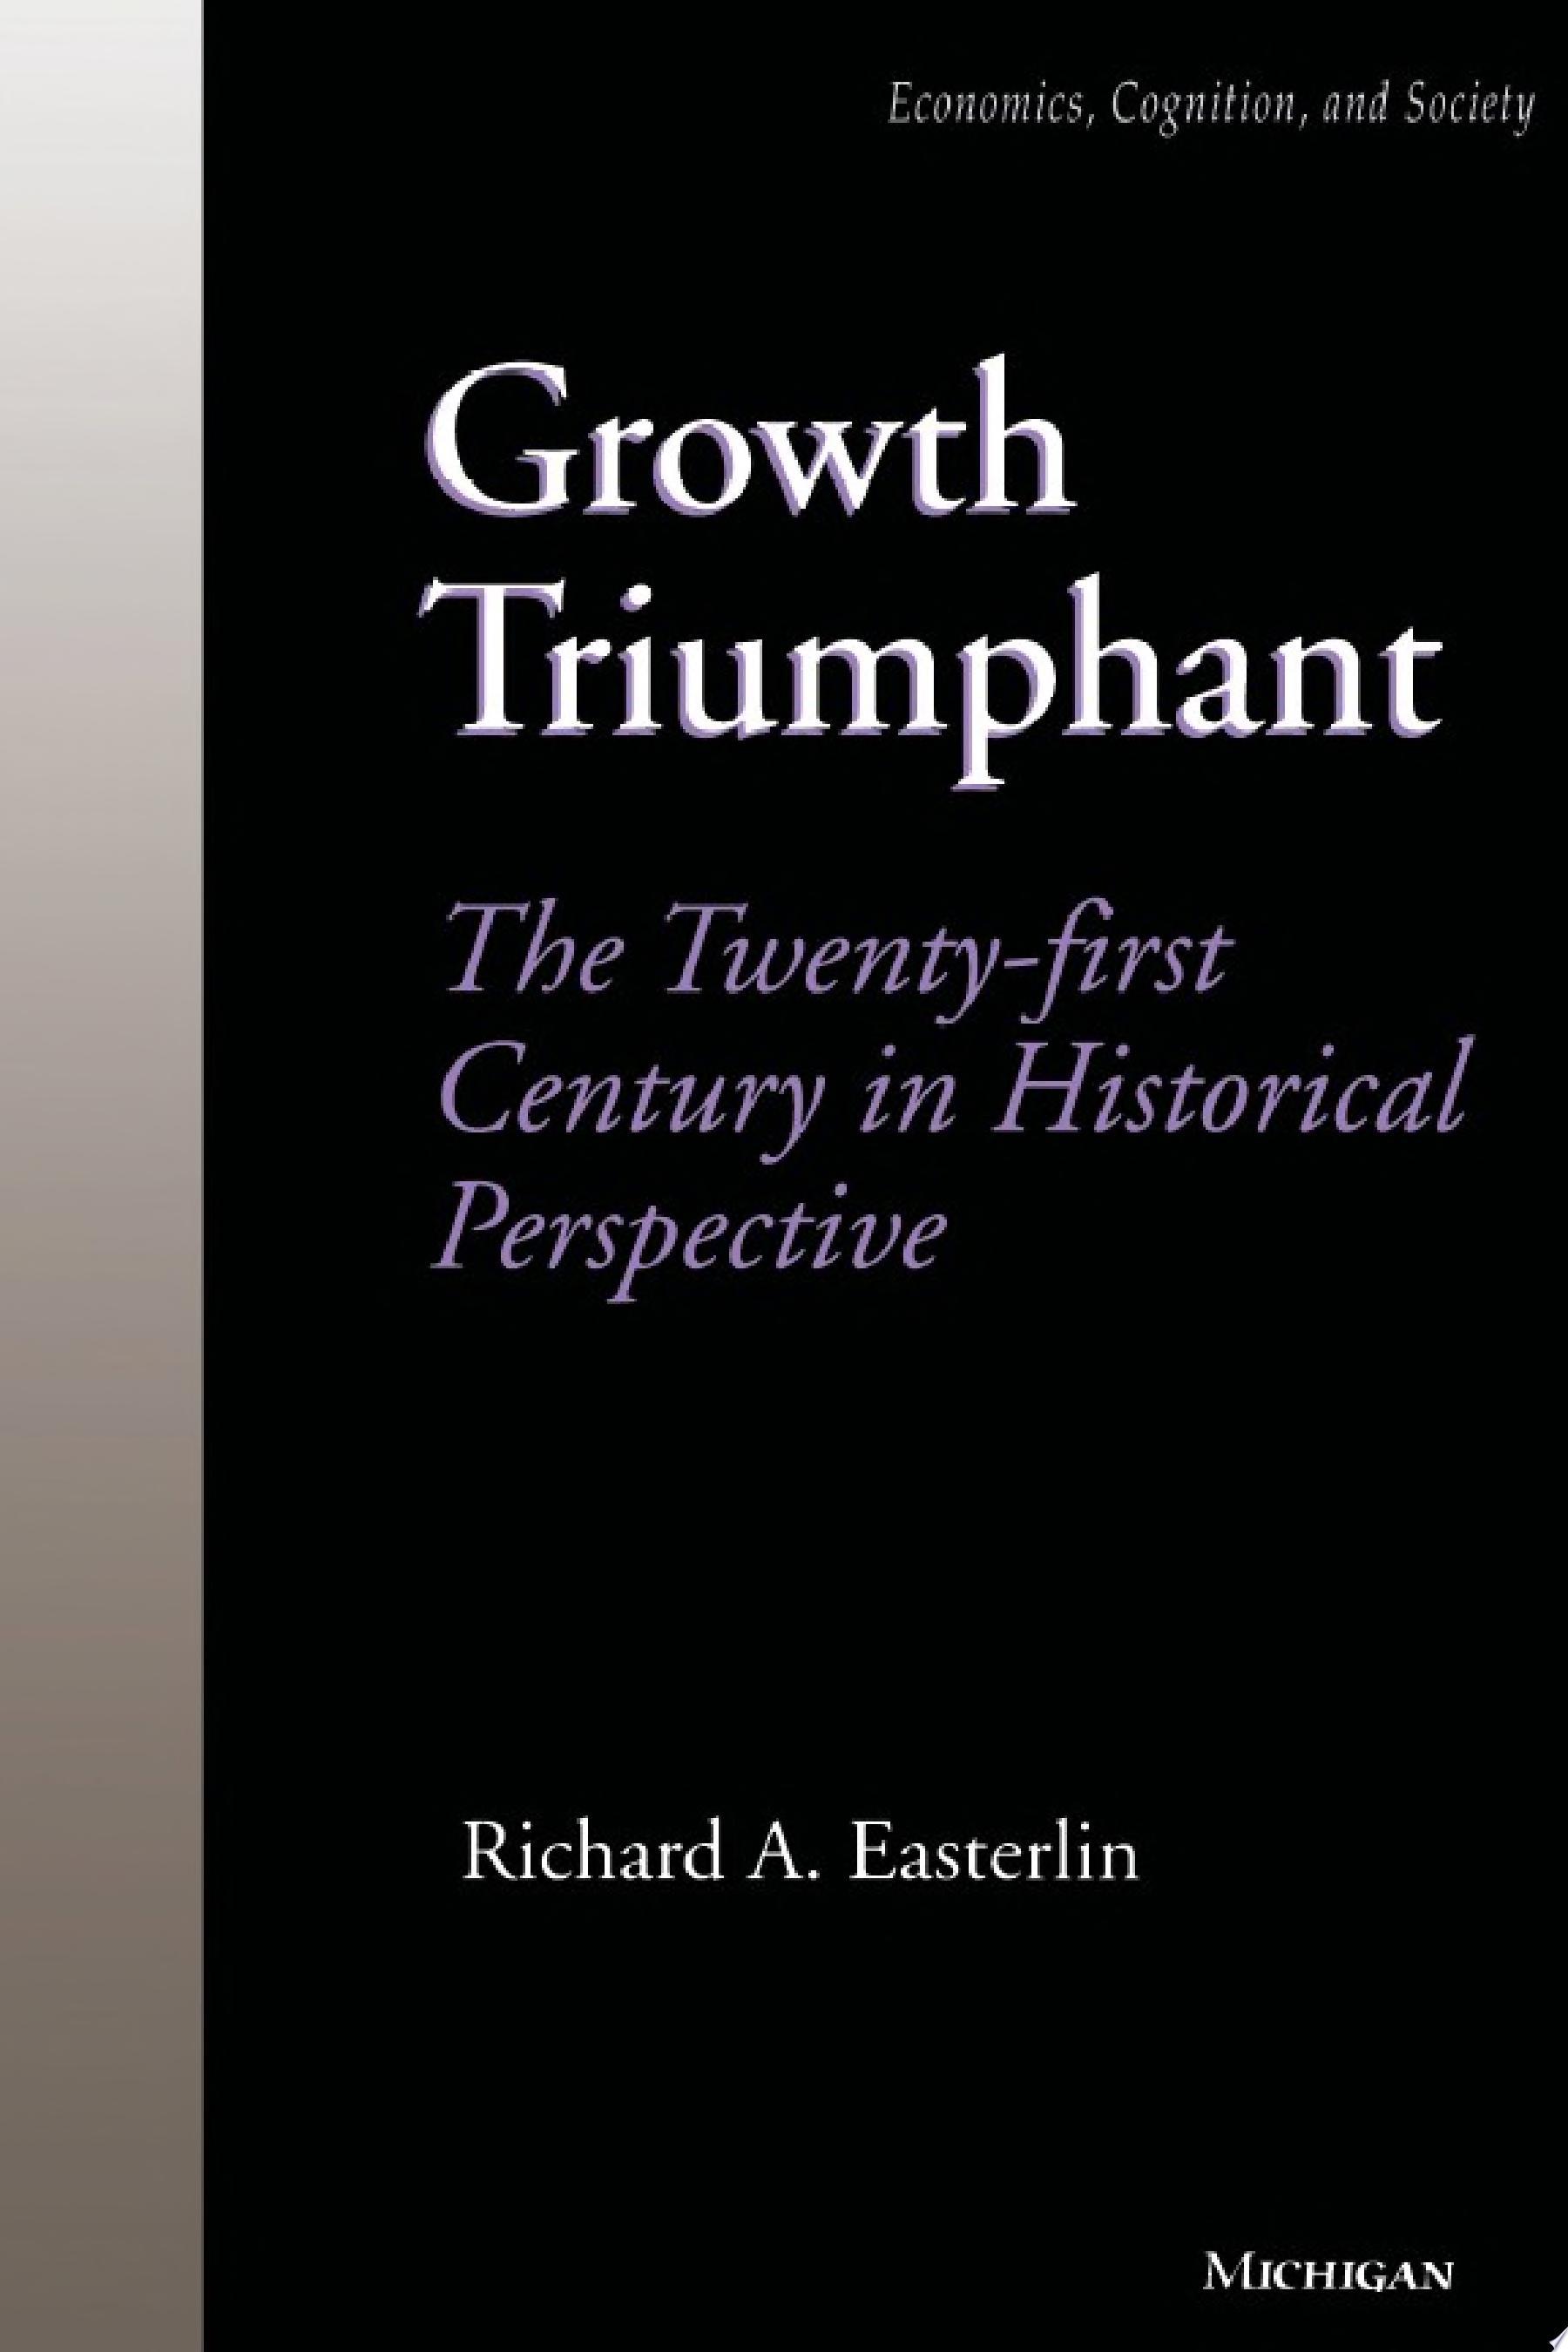 Growth Triumphant